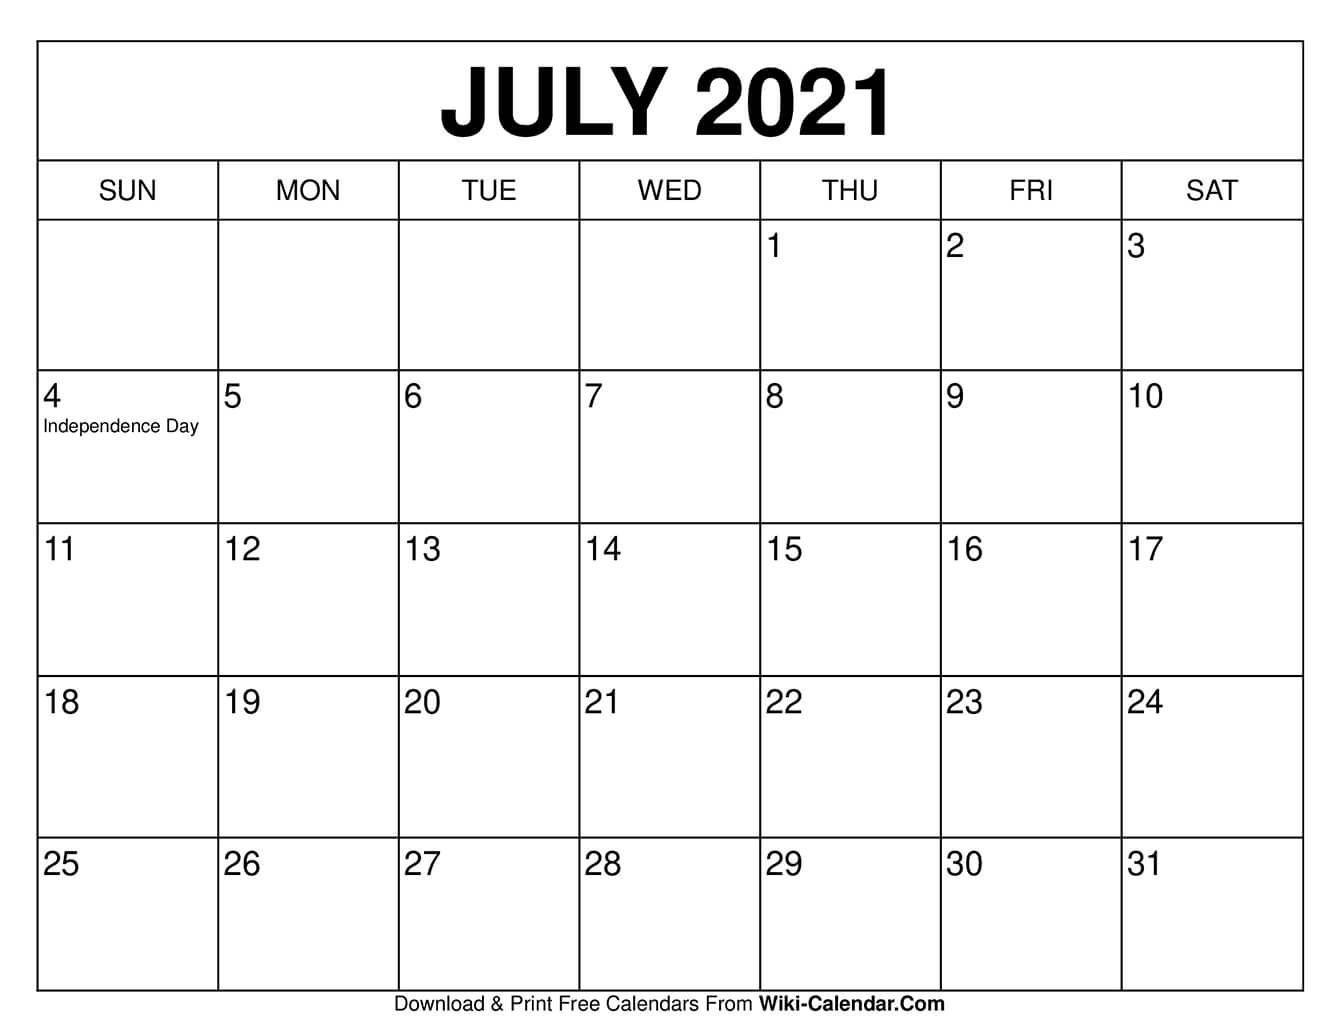 July 2021 Calendar In 2020 | Blank Calendar Template